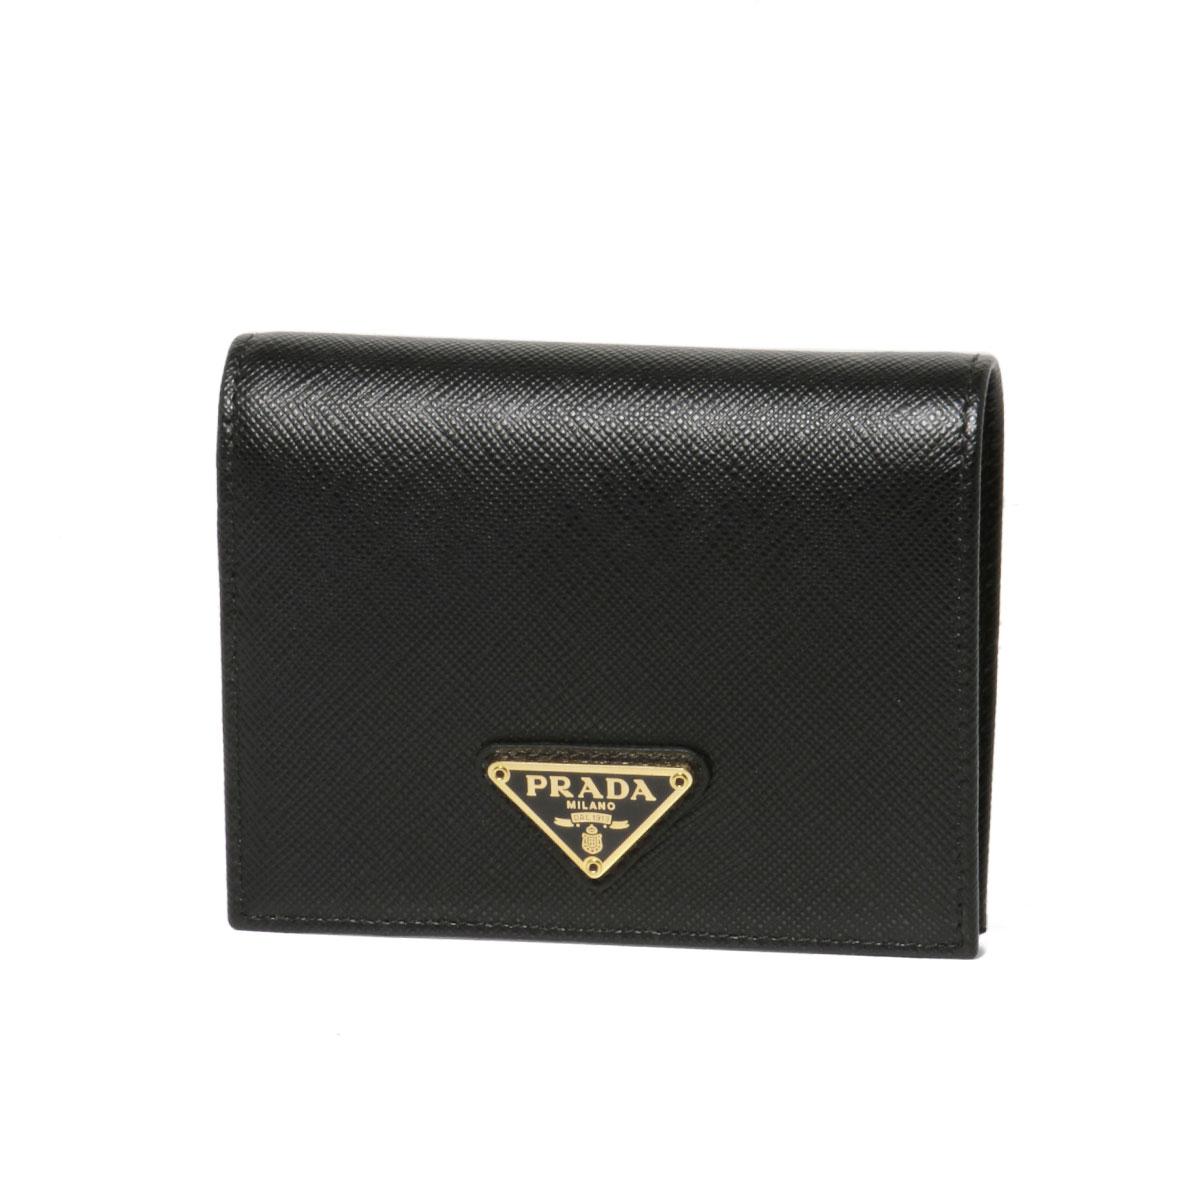 faff957e066b importshopdouble: Prada PRADA wallet Lady's 1MV204 QHH F0002 folio wallet  SAFFIANO TRIANGOLO NERO black | Rakuten Global Market